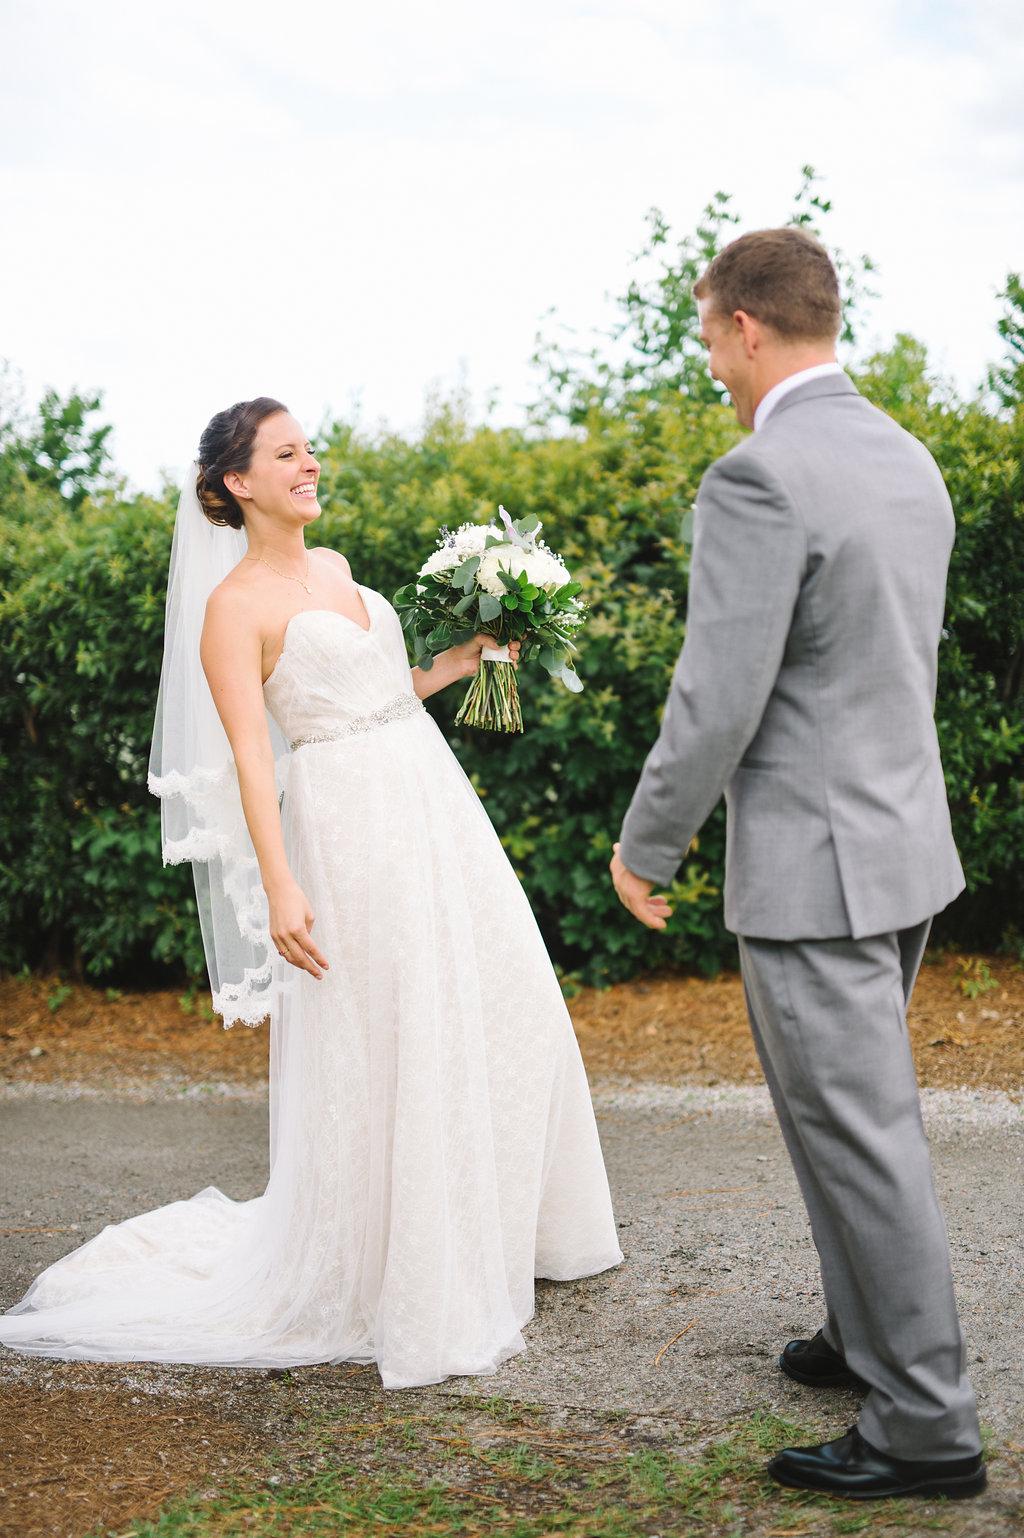 meagan-and-brenden-rach-loves-troy-photography-ivory-and-beau-bridal-boutqiue-ti-adora-wedding-dress-gold-lace-wedding-dress-savannah-wedding-planner-savannah-weddings-oldfield-plantation-wedding-savannah-florist-17.jpg